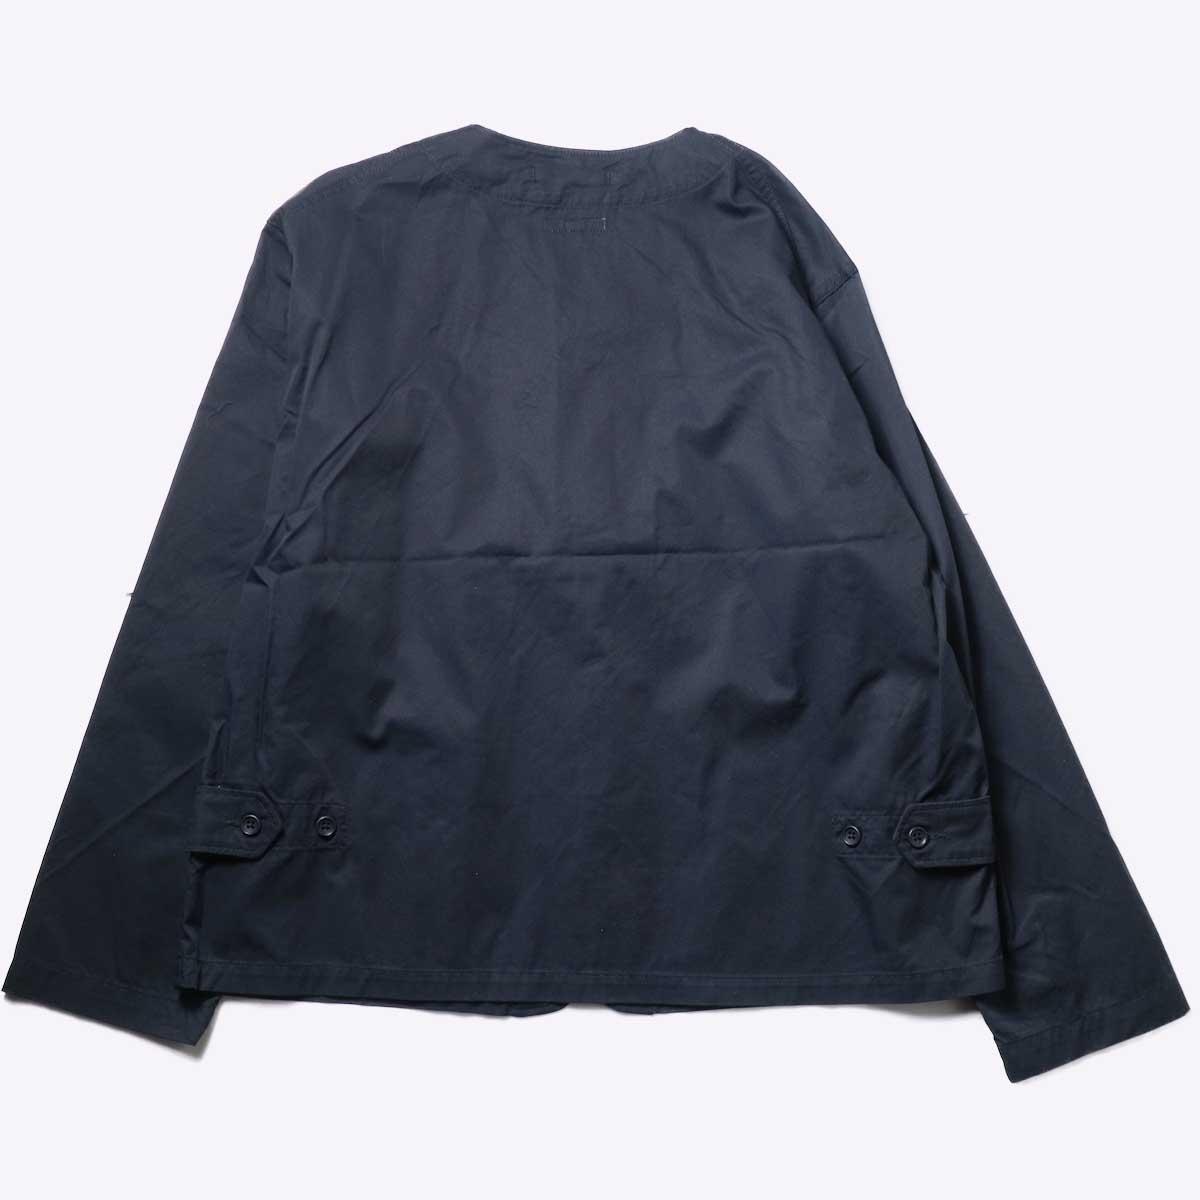 Engineered Garments / Cardigan Jacket -High Count Twill (Black)背面